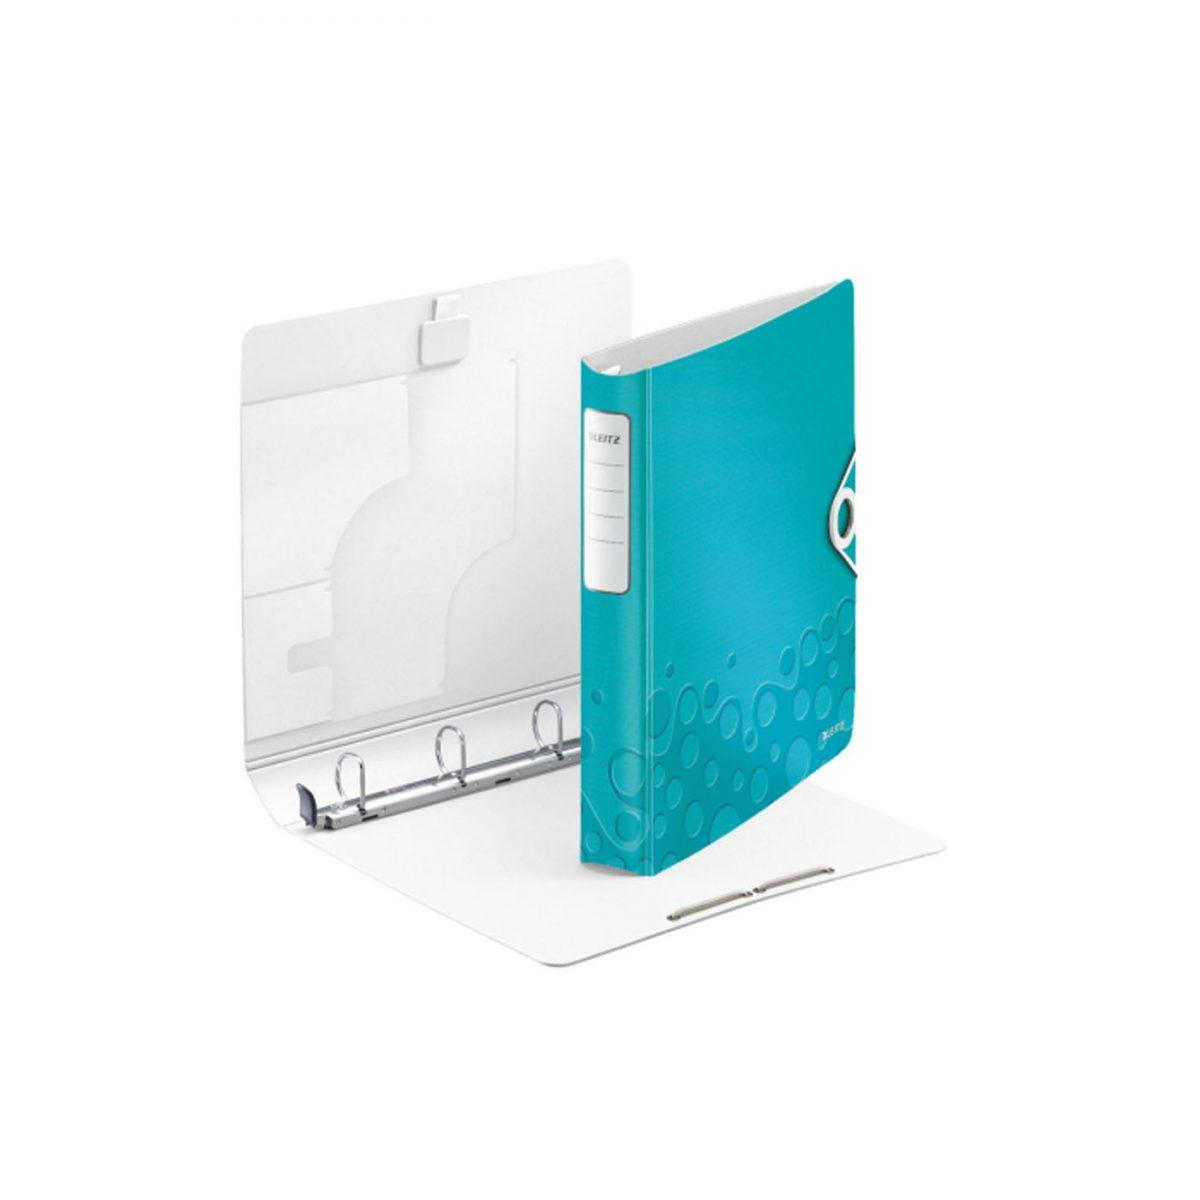 Caiet mecanic LEITZ Active Wow SoftClick, mecanism 4DR, inel 30mm, polyfoam - turcoaz metalizat